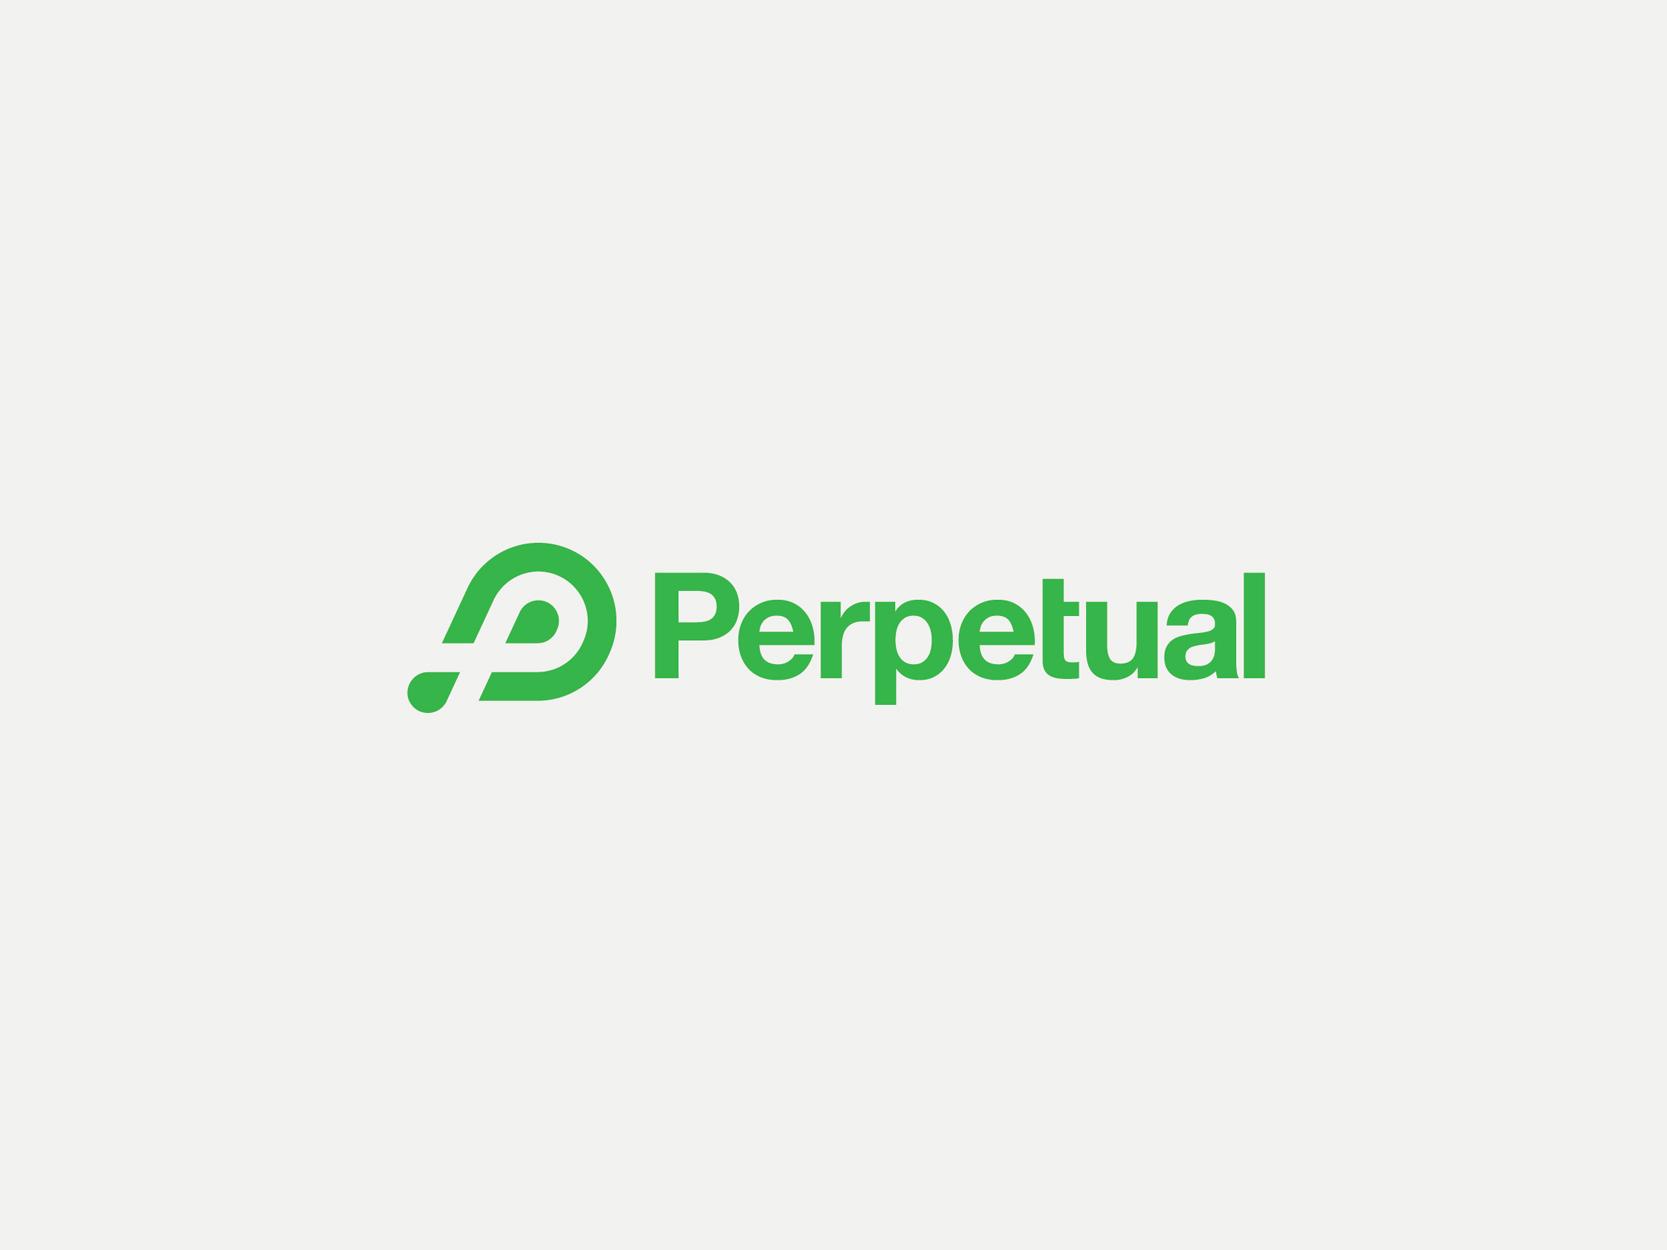 perpetual-01.jpg